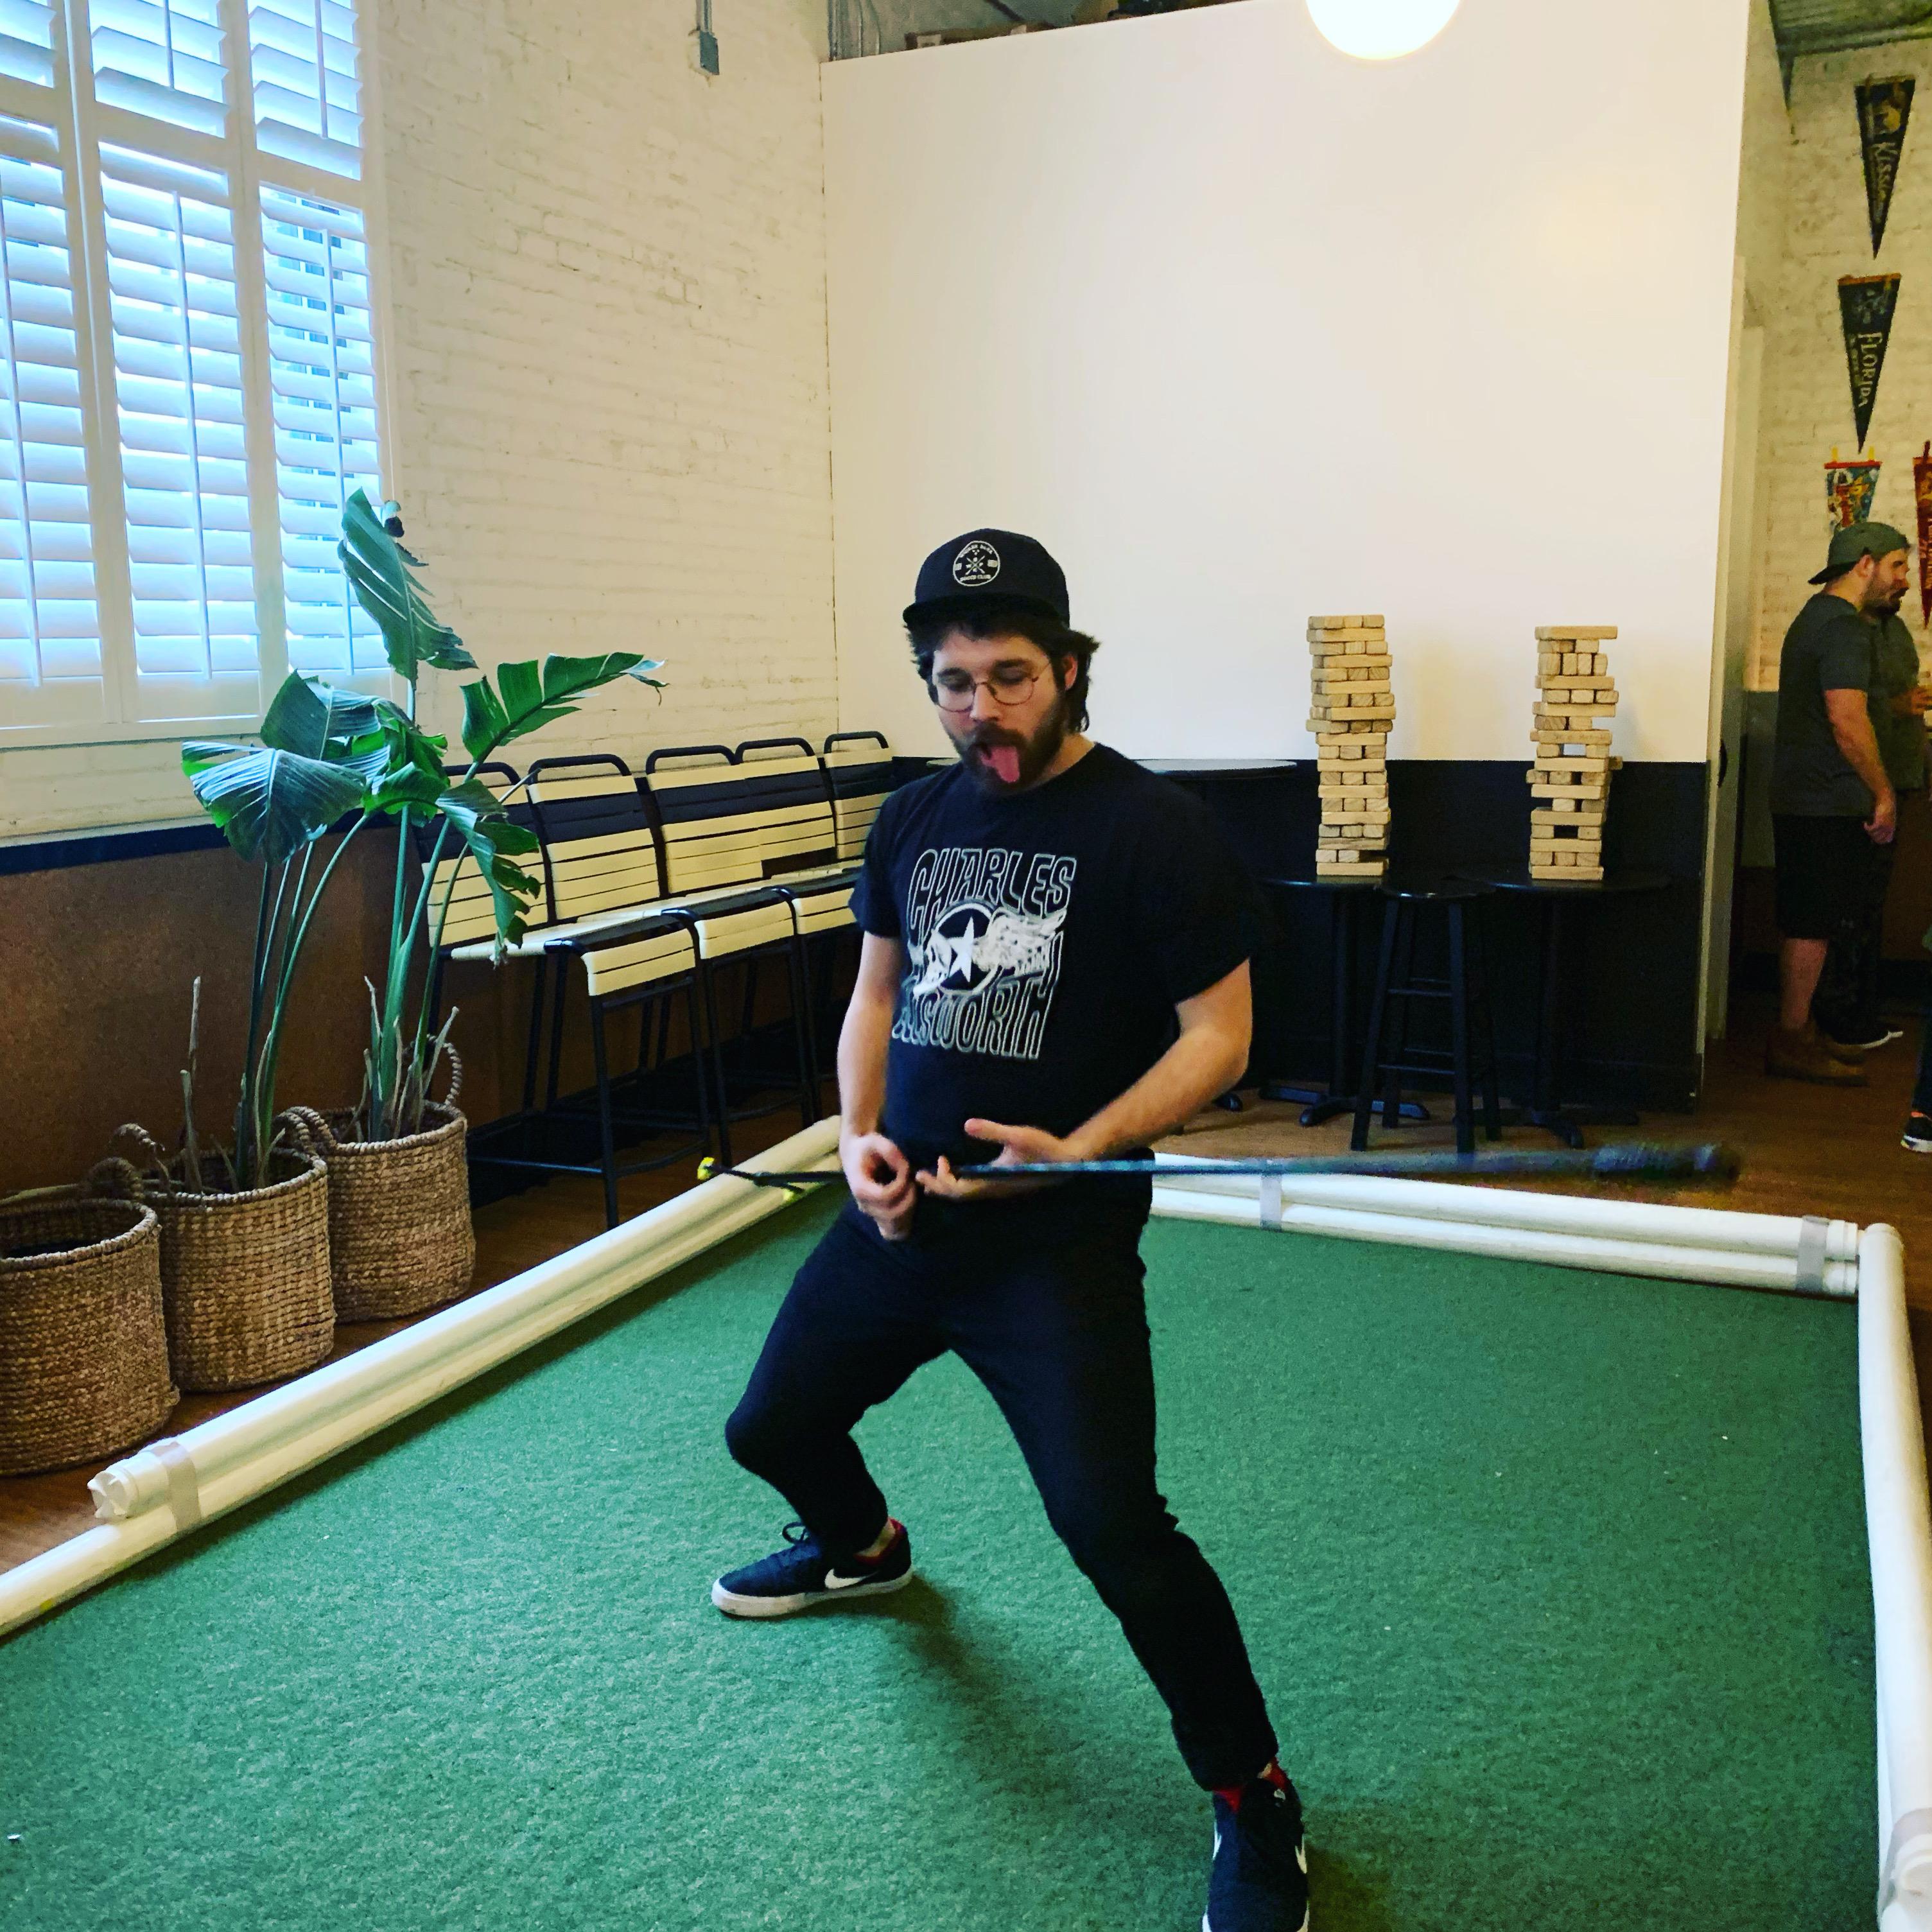 man plays air guitar with shuffleboard tang